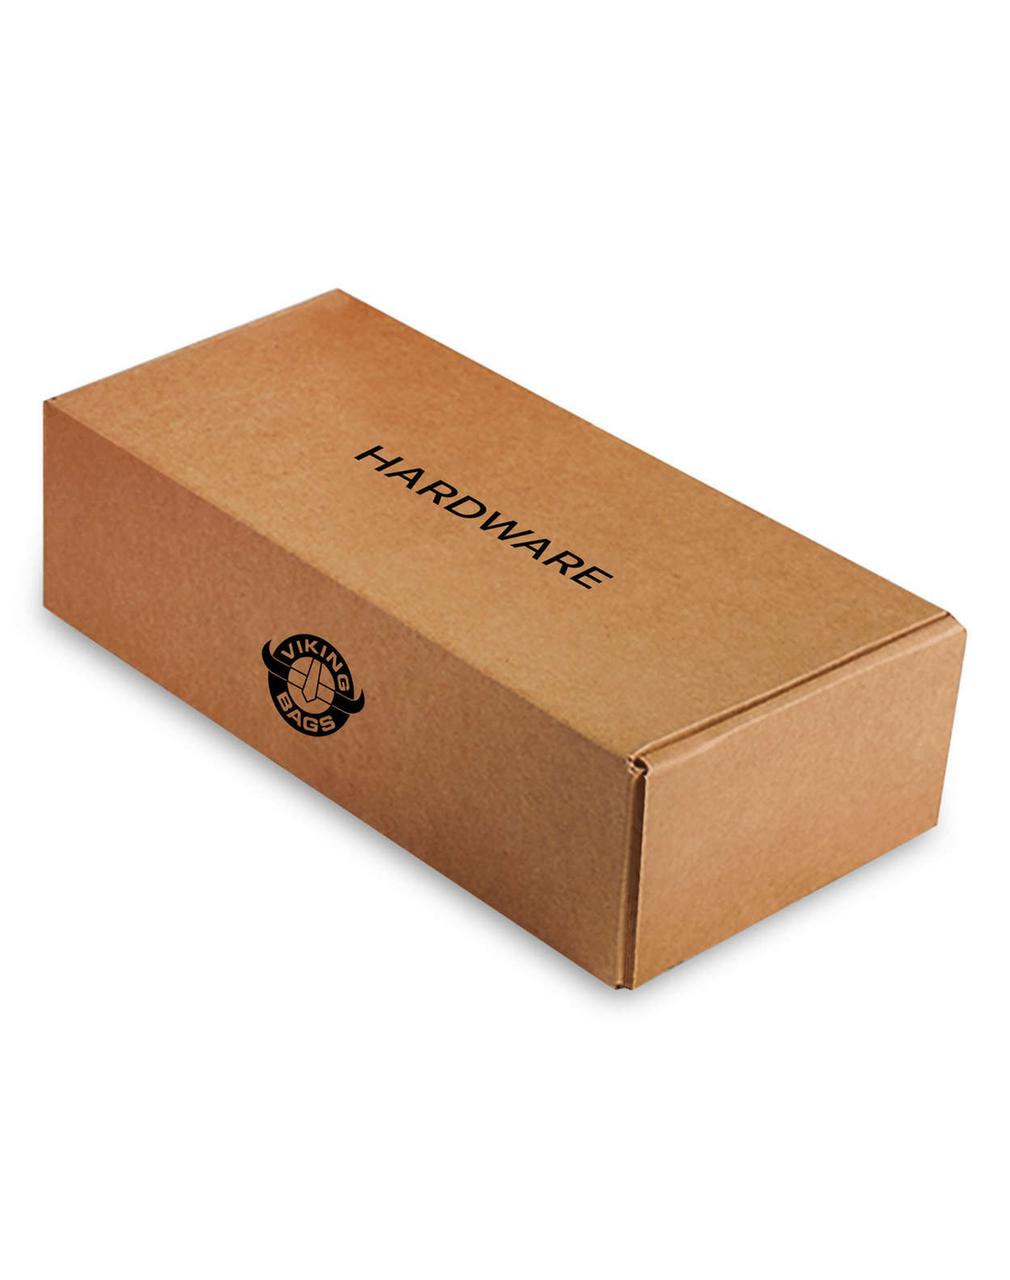 Honda 1100 Shadow Sabre Hammer Series Studded Extra Large Motorcycle Saddlebags Hardware box